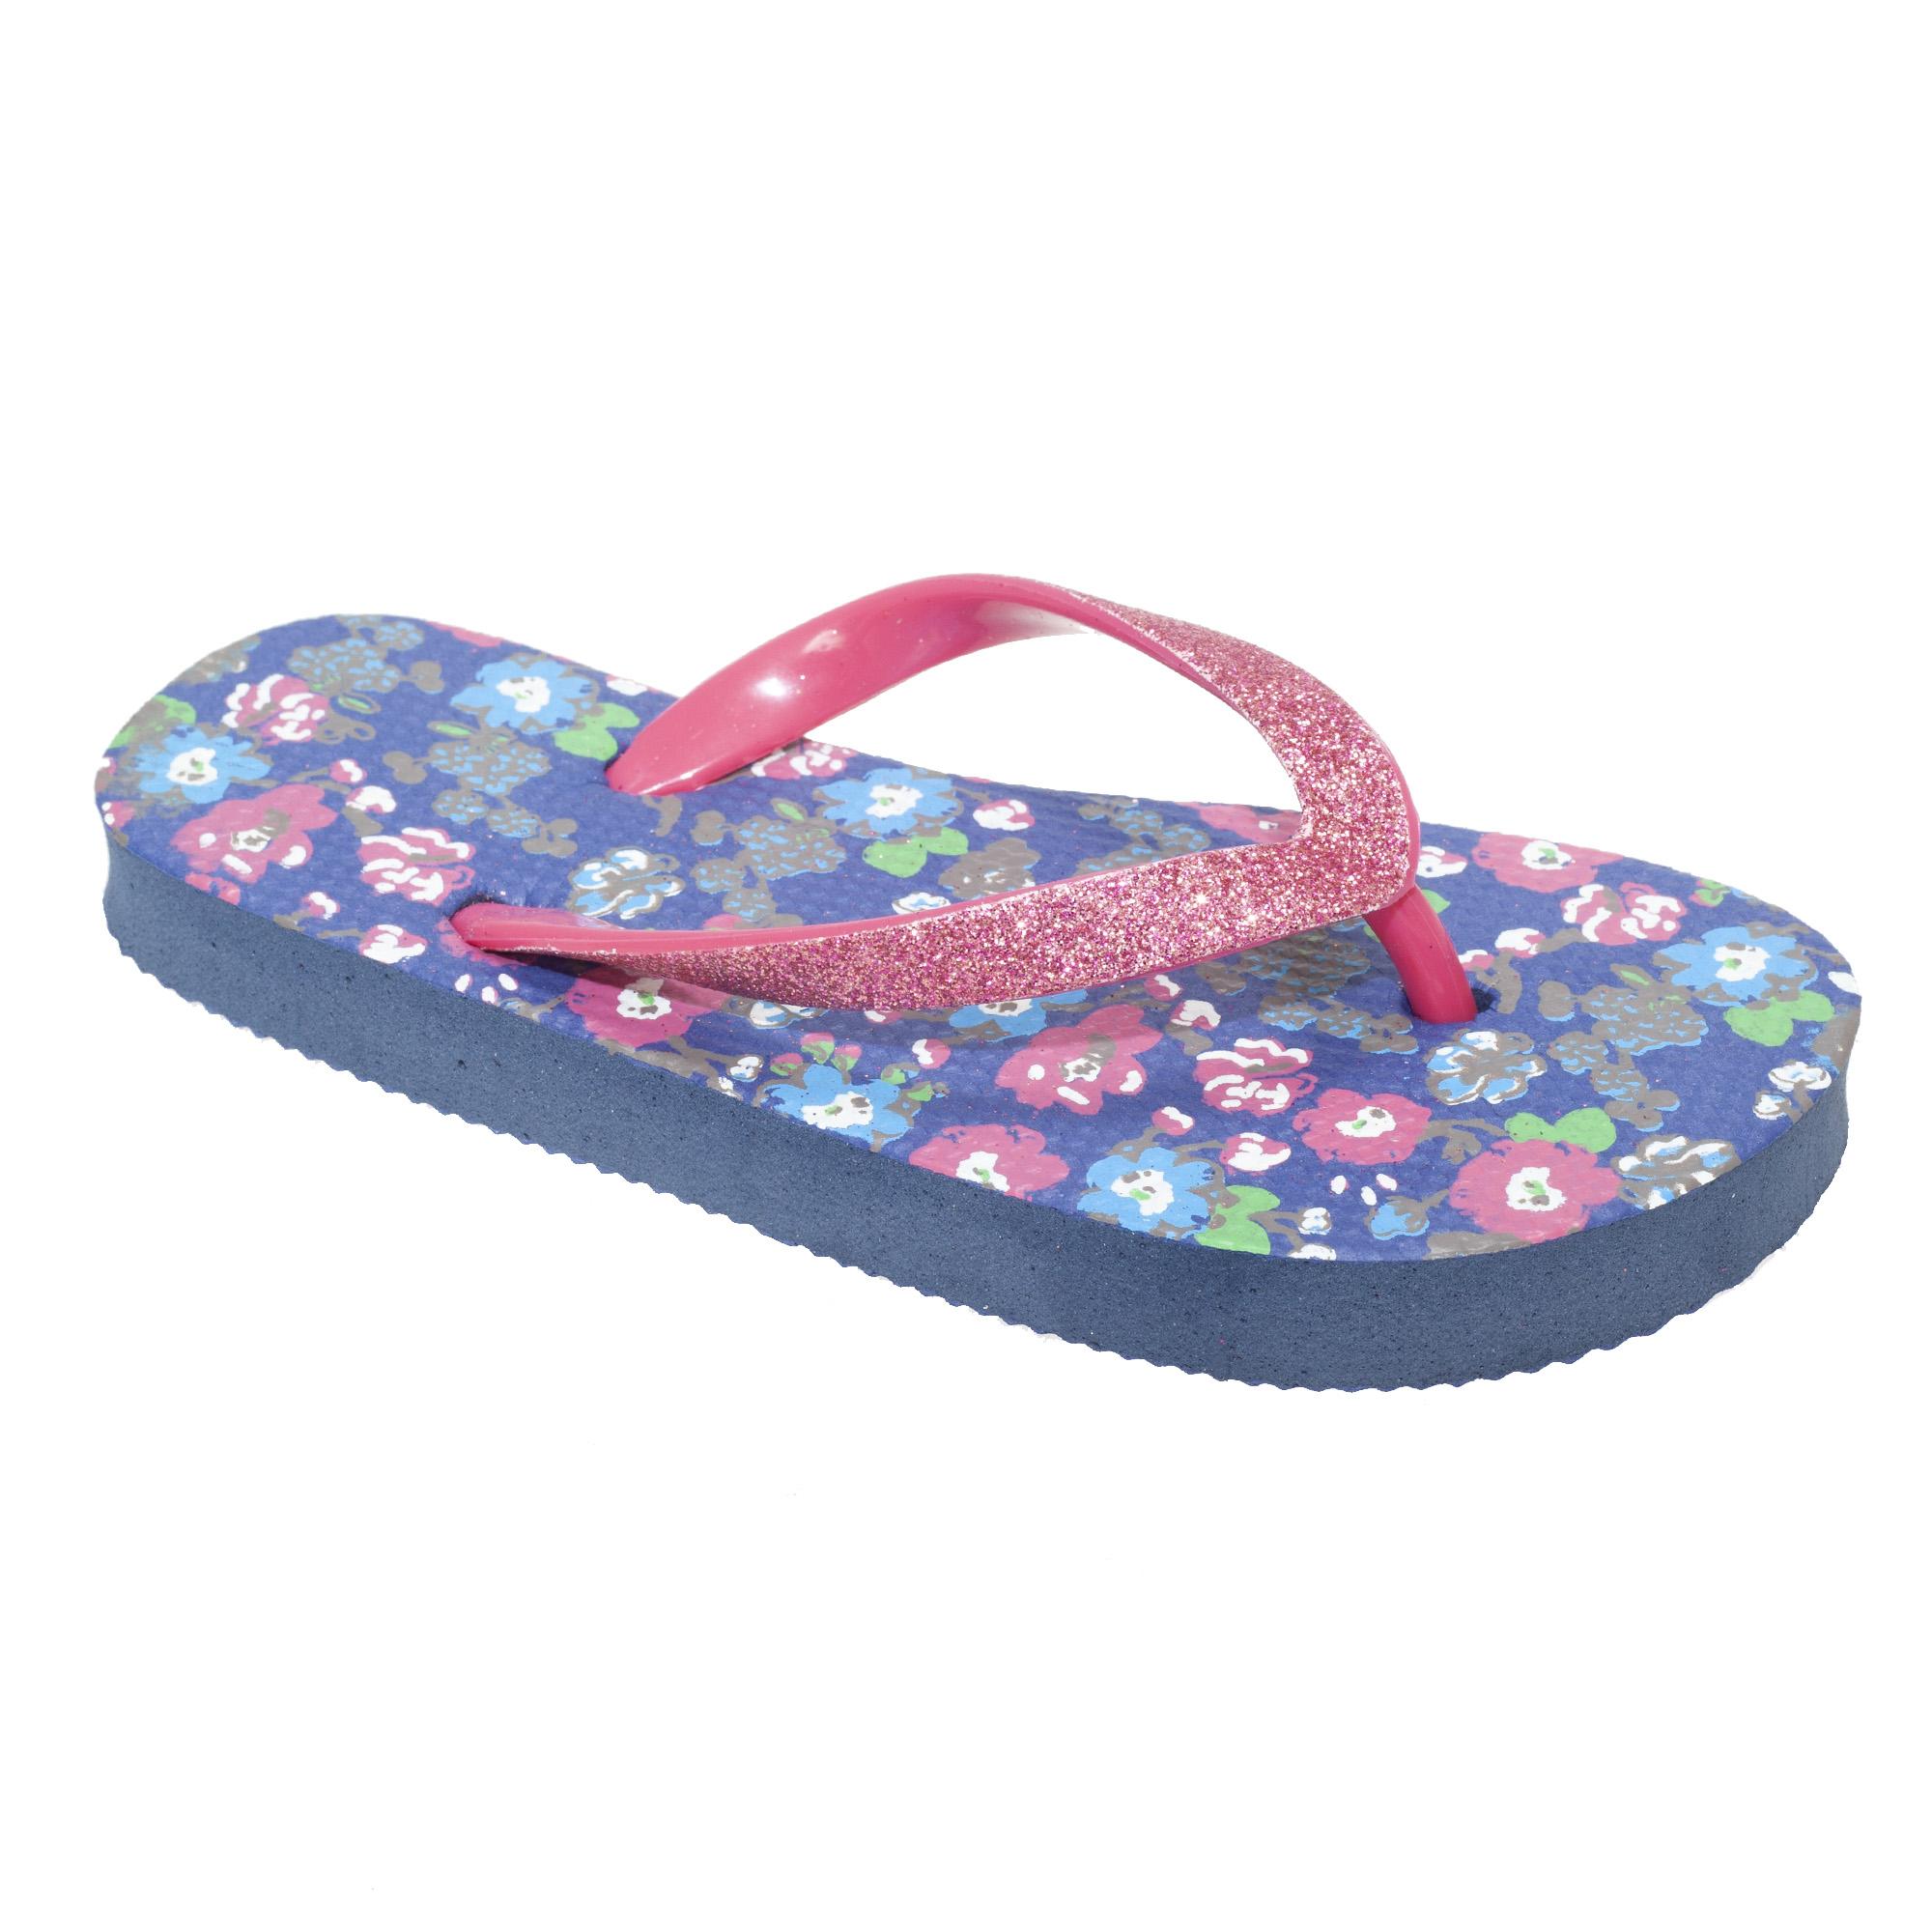 floso kinder m dchen floral flip flops mit glitterriemen ebay. Black Bedroom Furniture Sets. Home Design Ideas